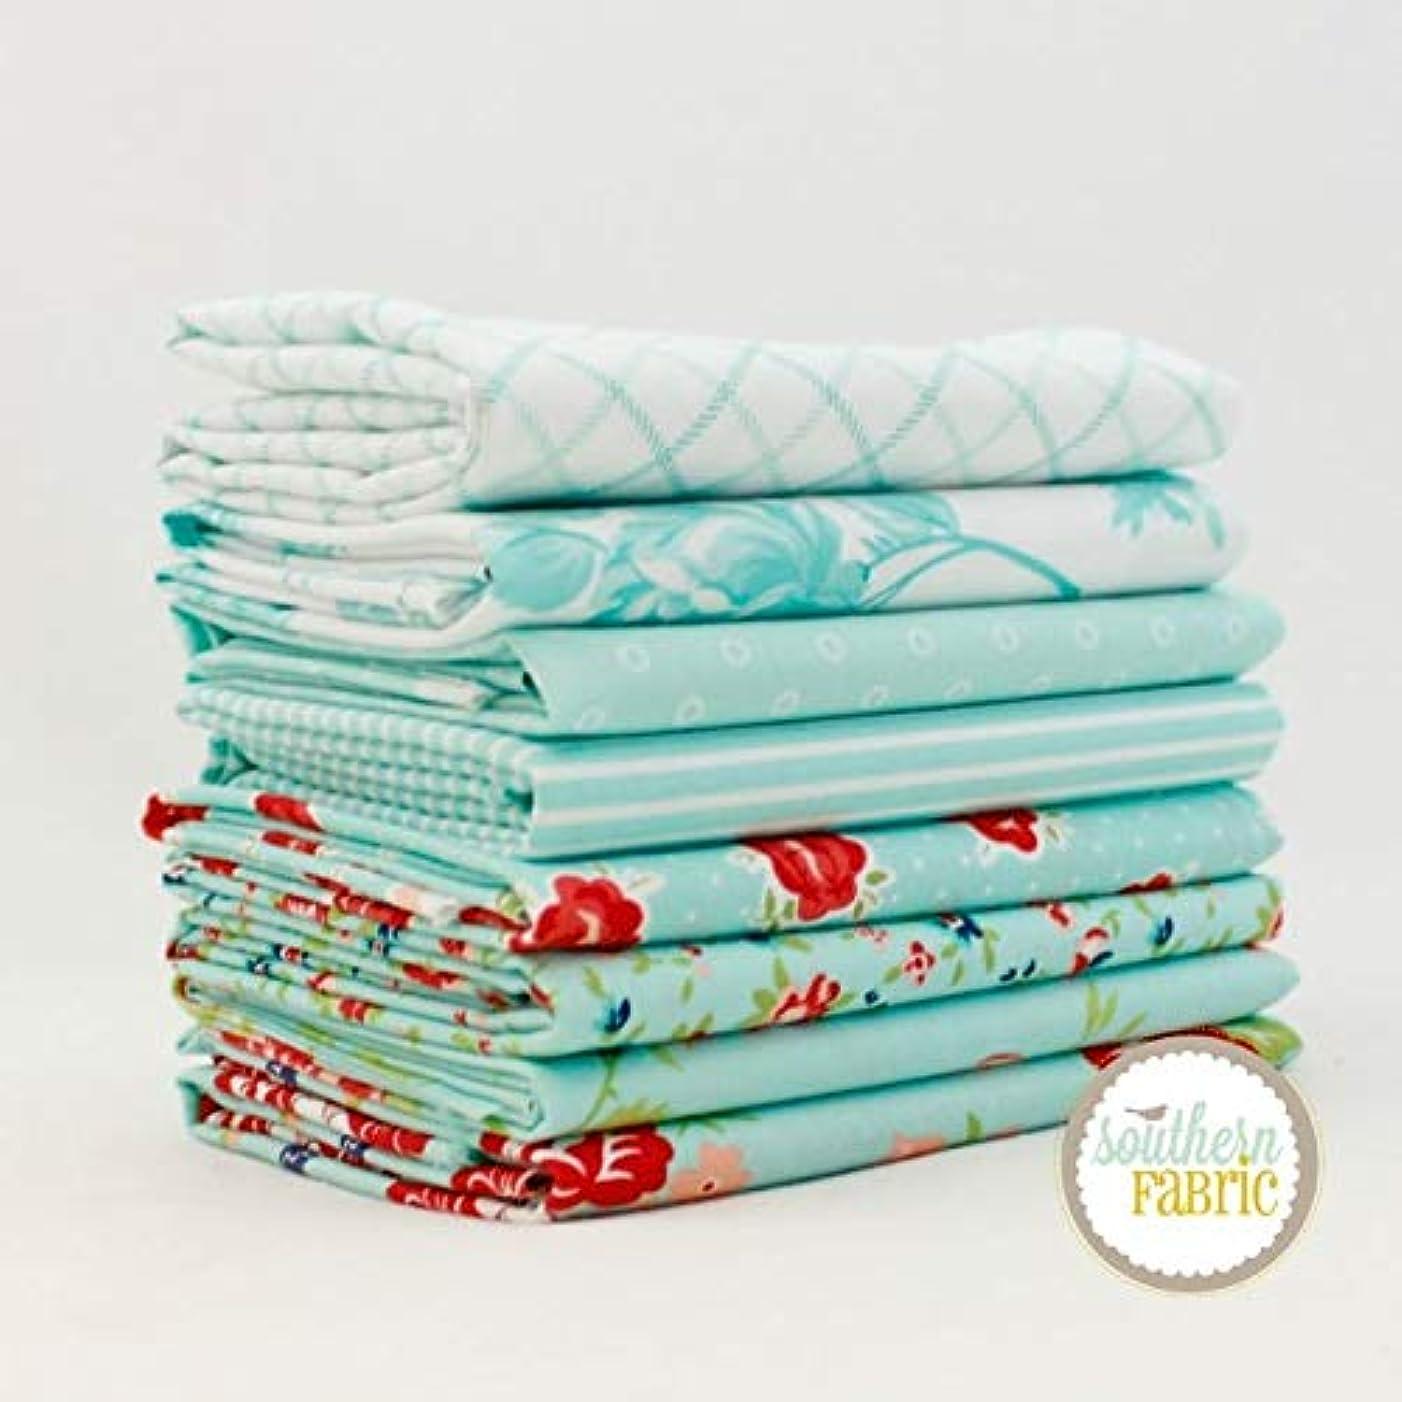 United Notions Smitten - Aqua Half Yard Bundle (8 pcs) by Bonnie and Camille 18 x 44 inches (45.72cm x 111.76cm) Fabric cuts DIY Quilt Fabric